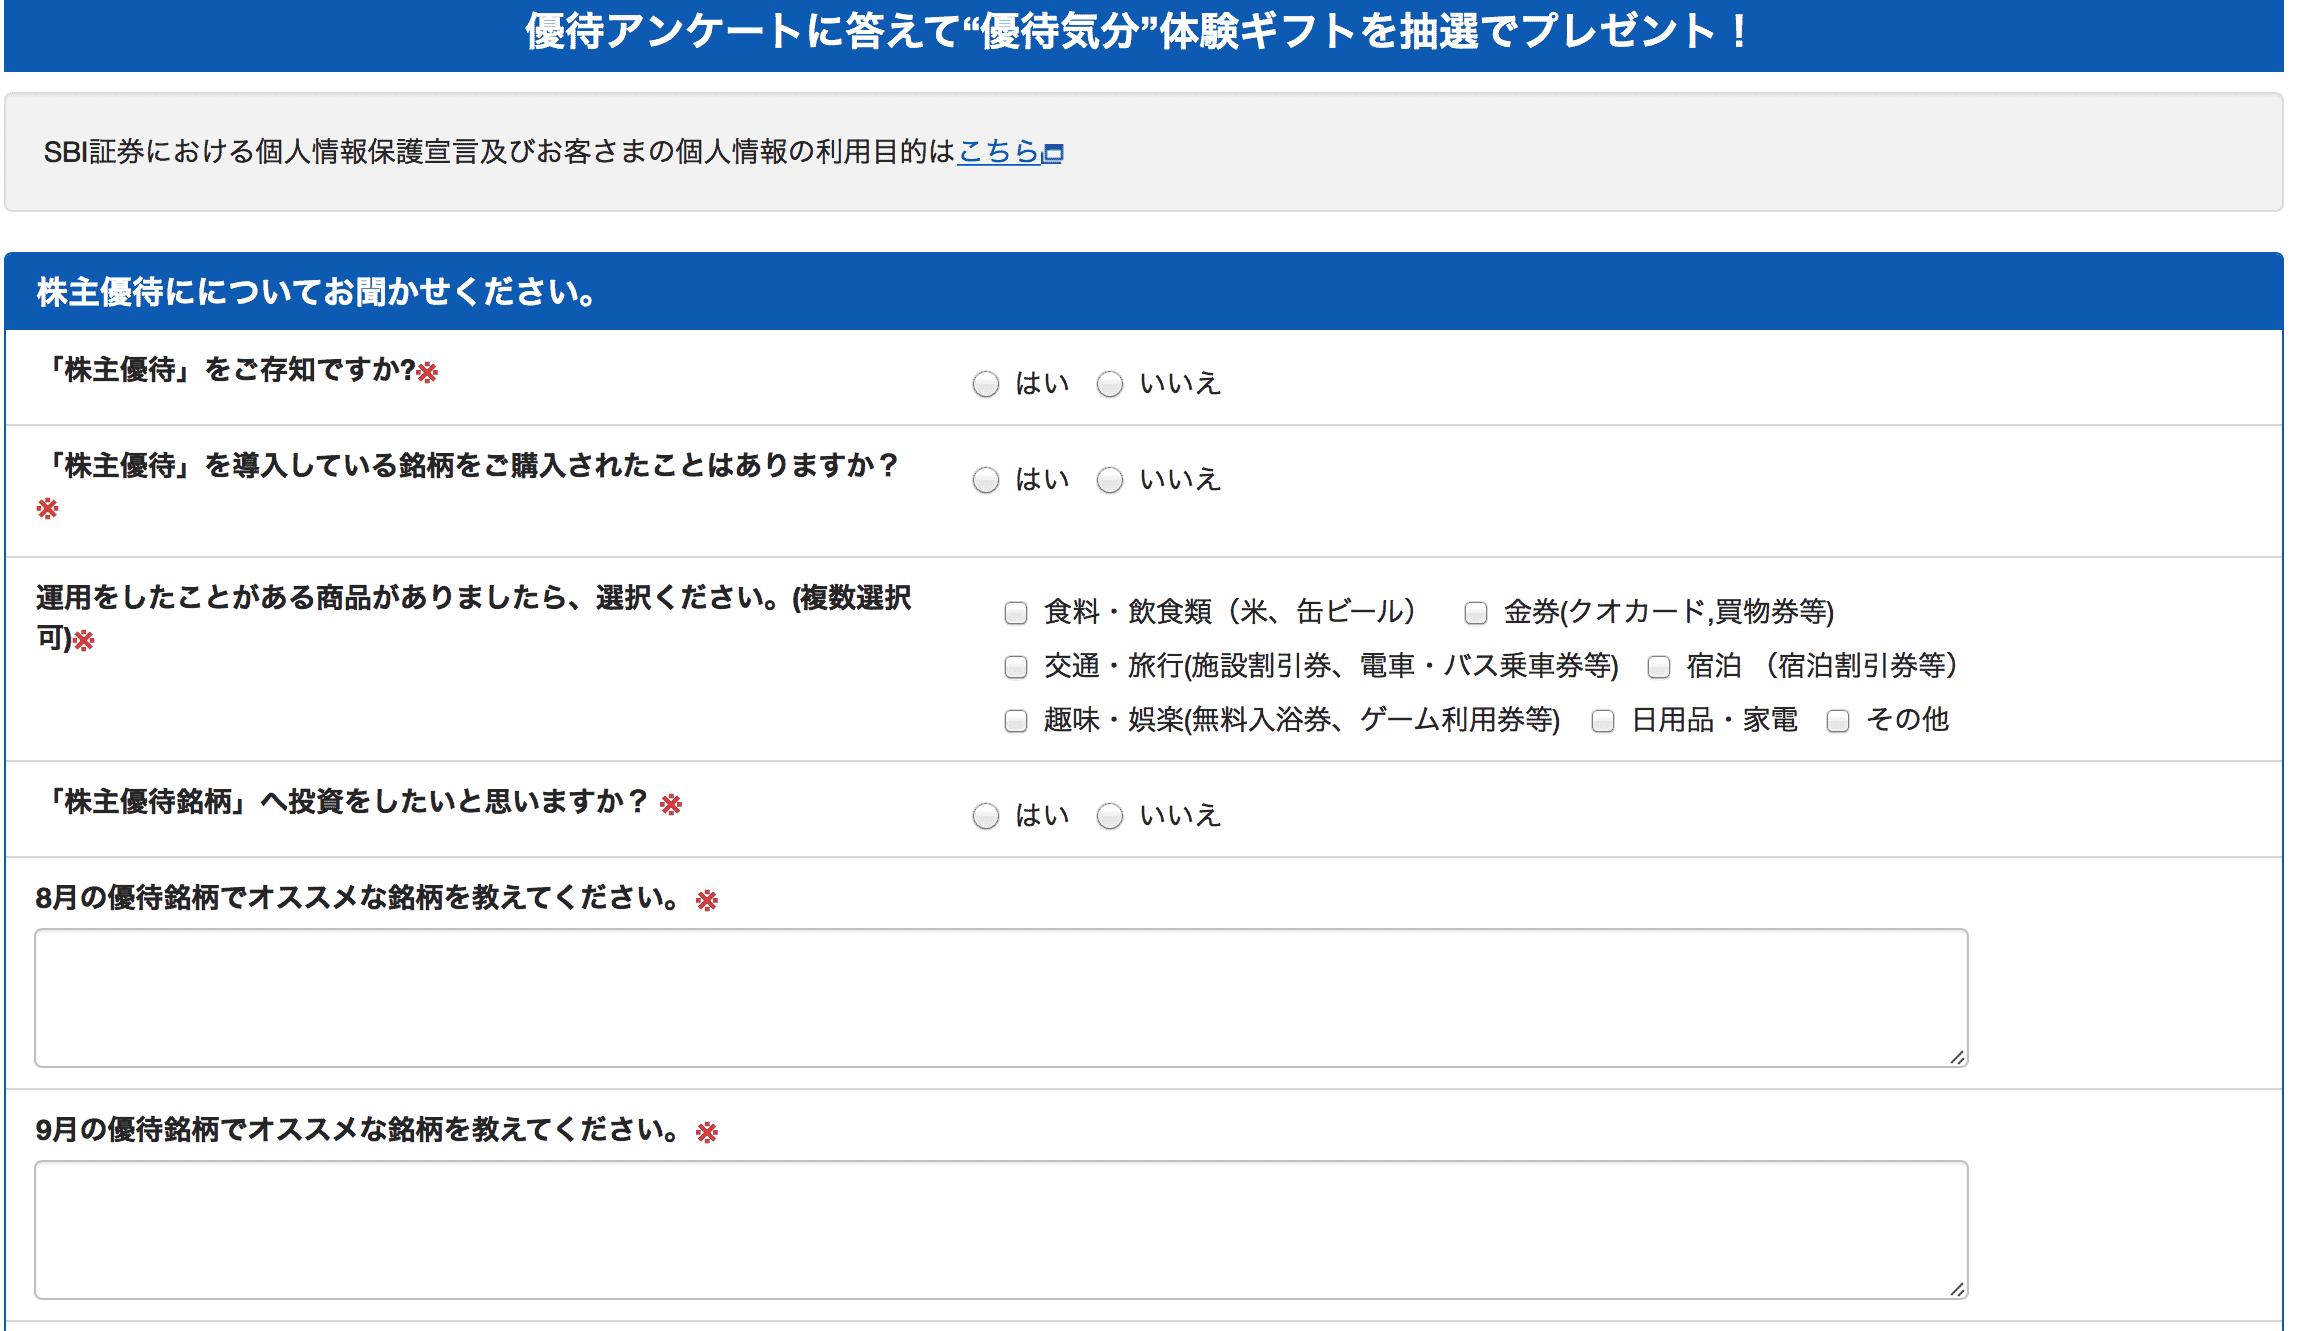 SBI証券の株主優待アンケート